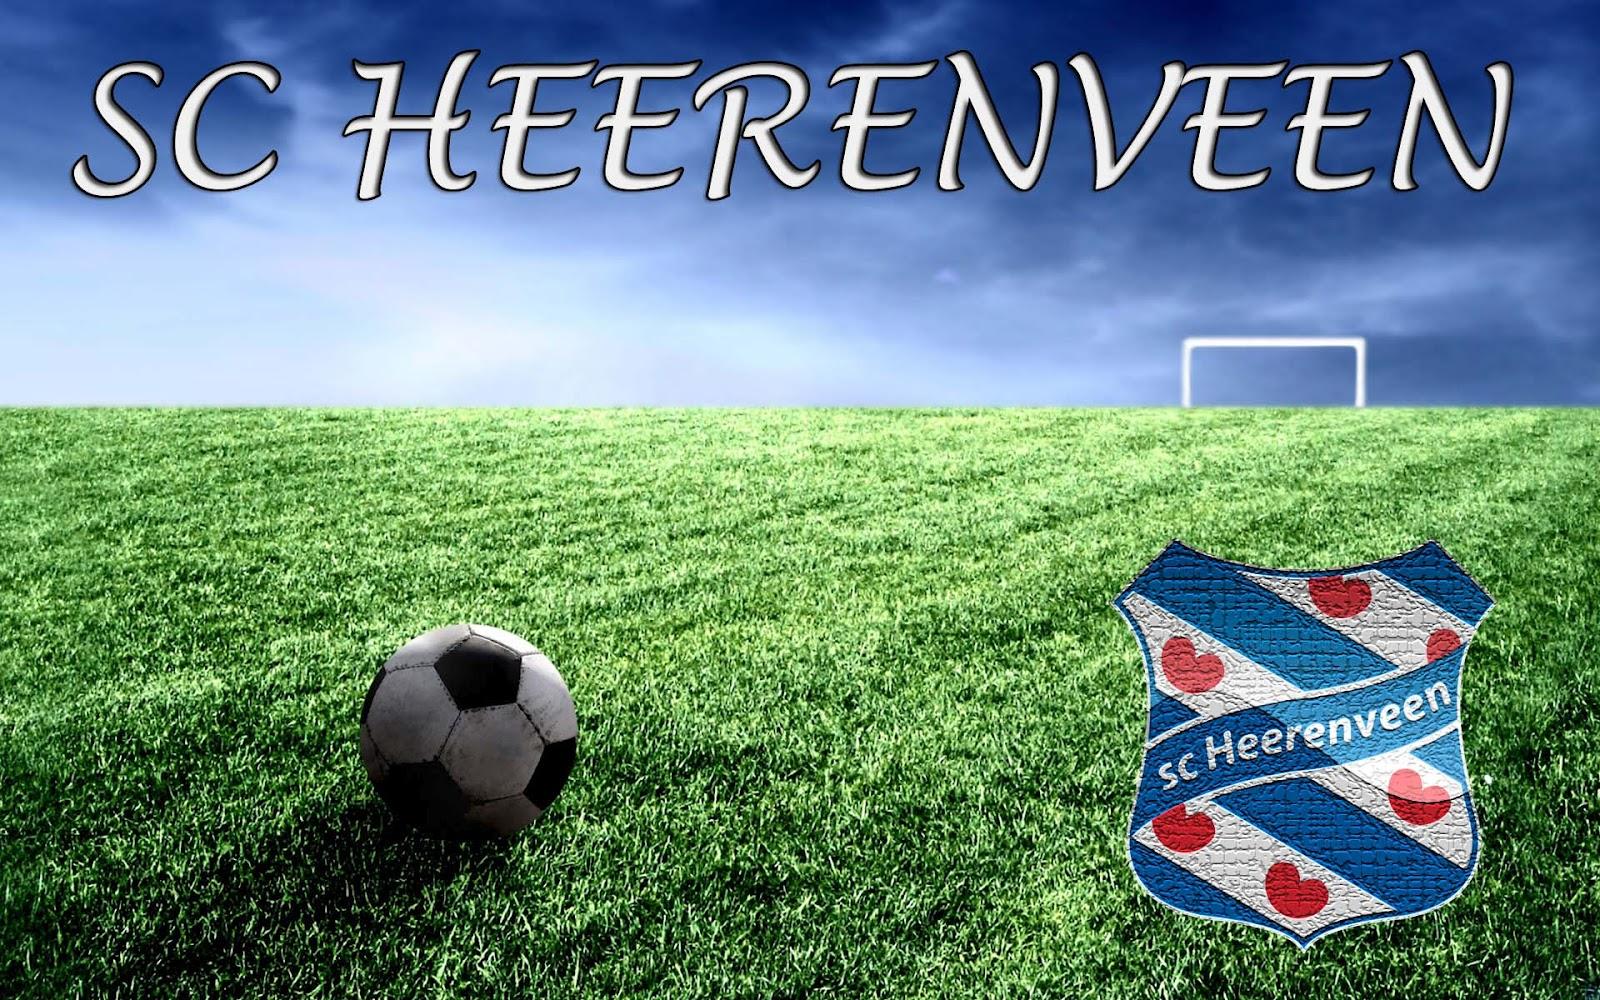 http://2.bp.blogspot.com/-9ekFb-lhXKY/T2XTJpSoi1I/AAAAAAAAb5w/trYIldAPvLg/s1600/Voetbalclub-sc-heerenveen-achtergronden-hd-heerenveen-wallpapers-voetbal-02.jpg